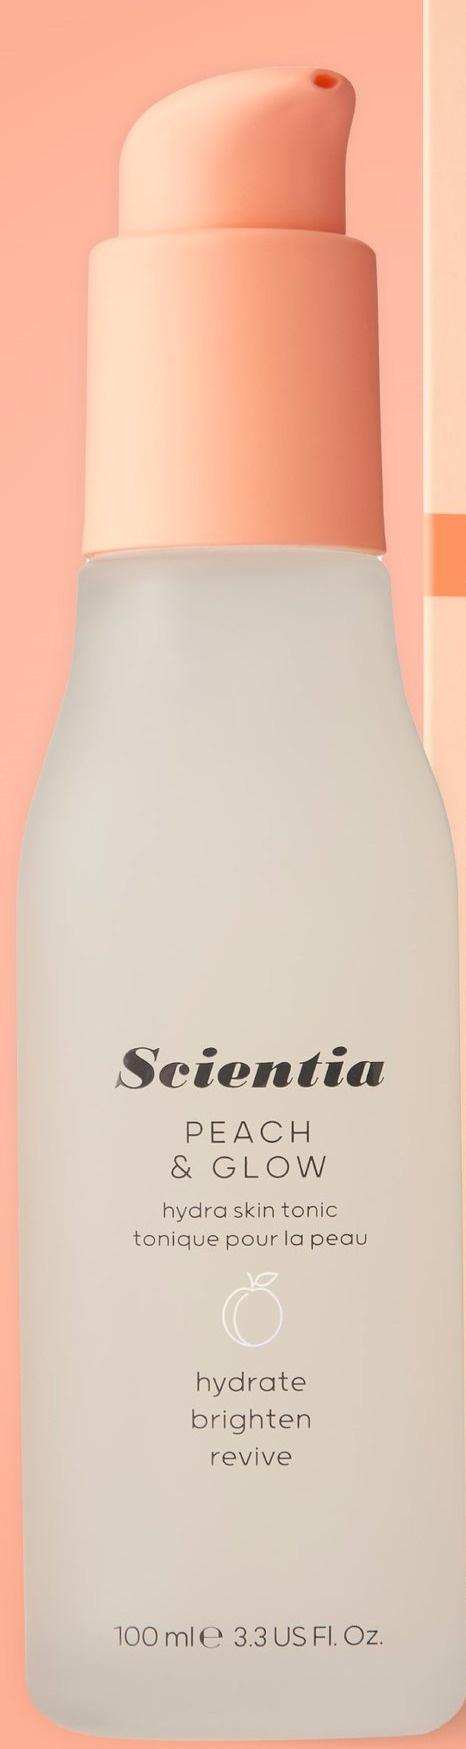 Scientia Peach & Glow Hydra Skin Tonic